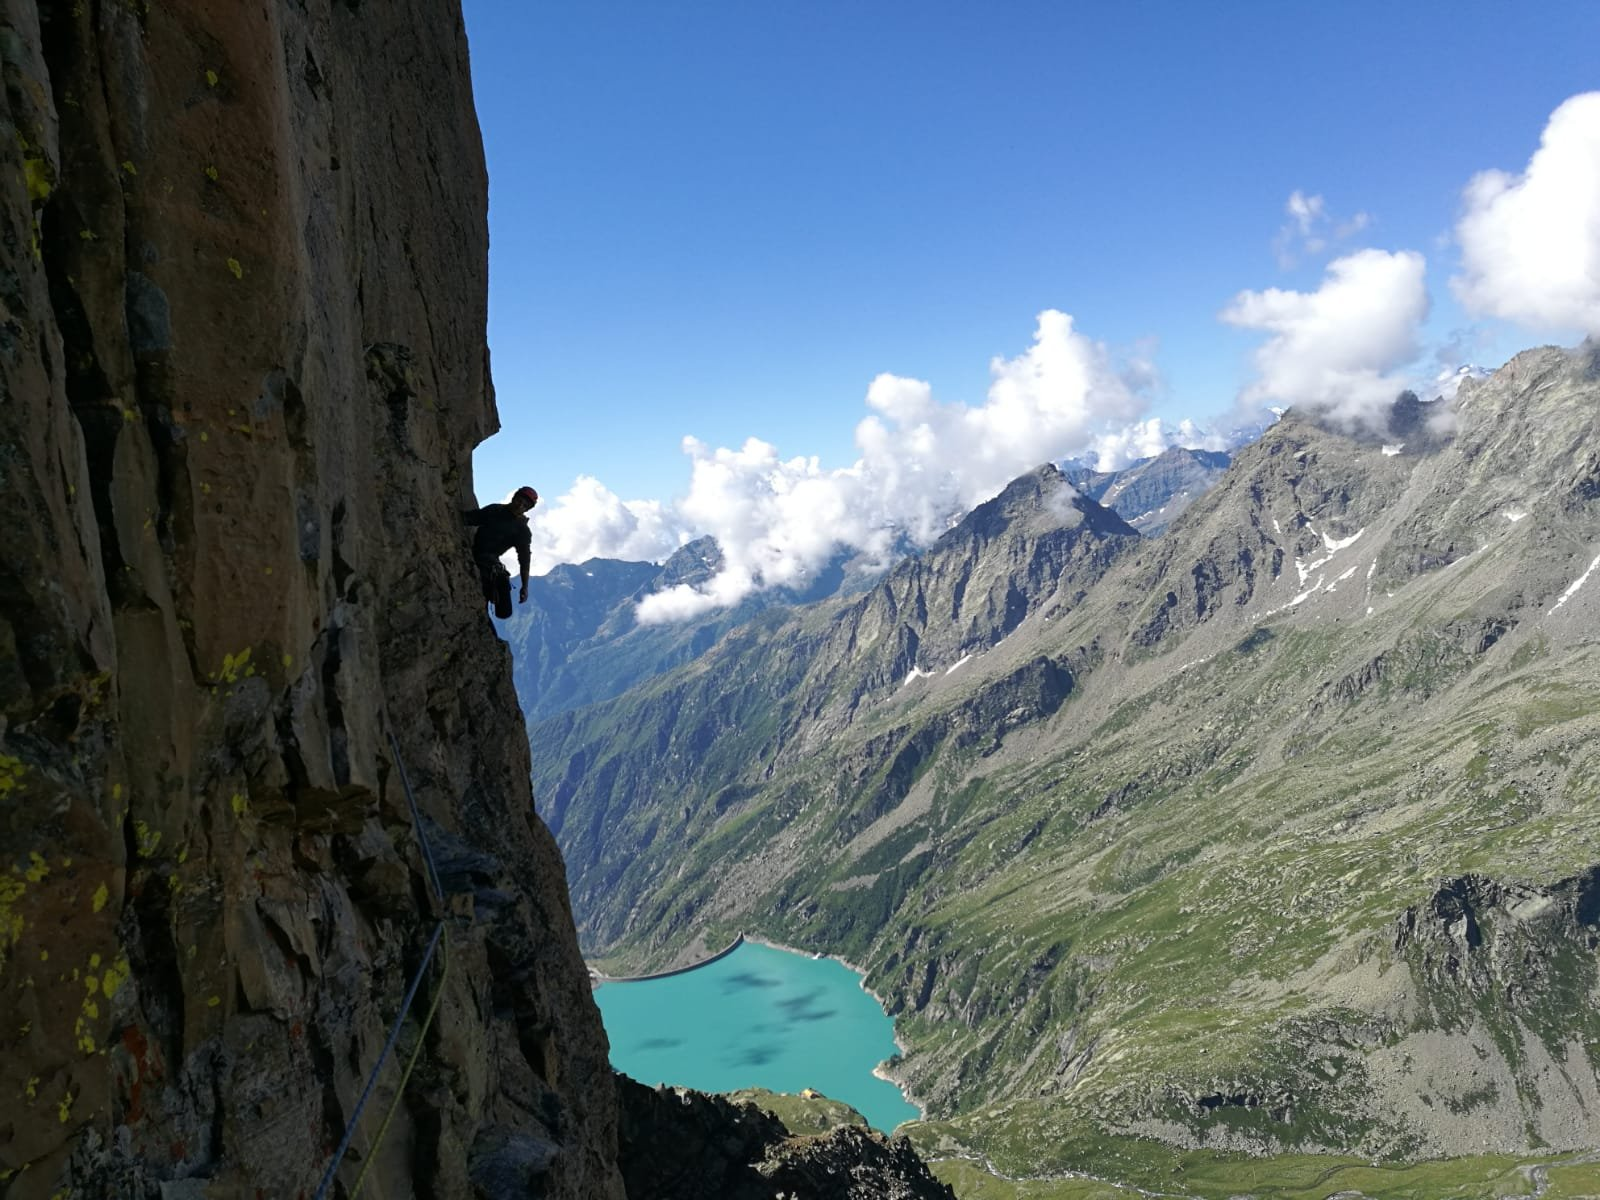 Valsoera (Becco di) Sturm und Drang 2019-07-30